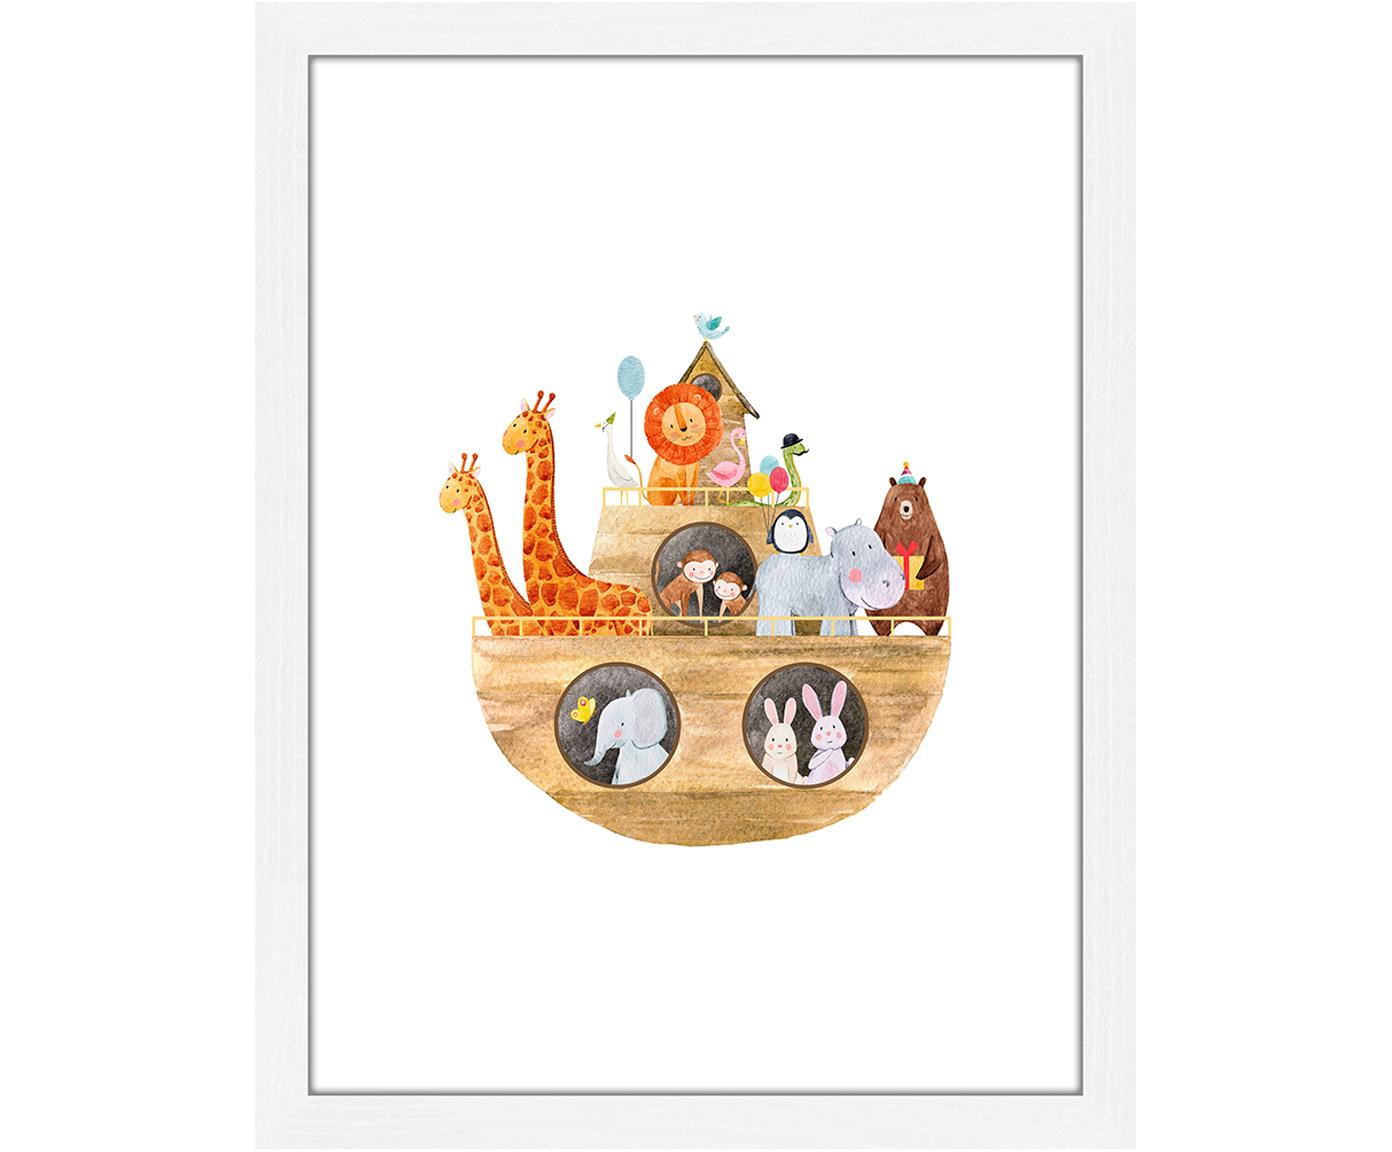 Ingelijste digitale print Noah's Ark, Lijst: gelakt hout, Wit, multicolour, 33 x 43 cm